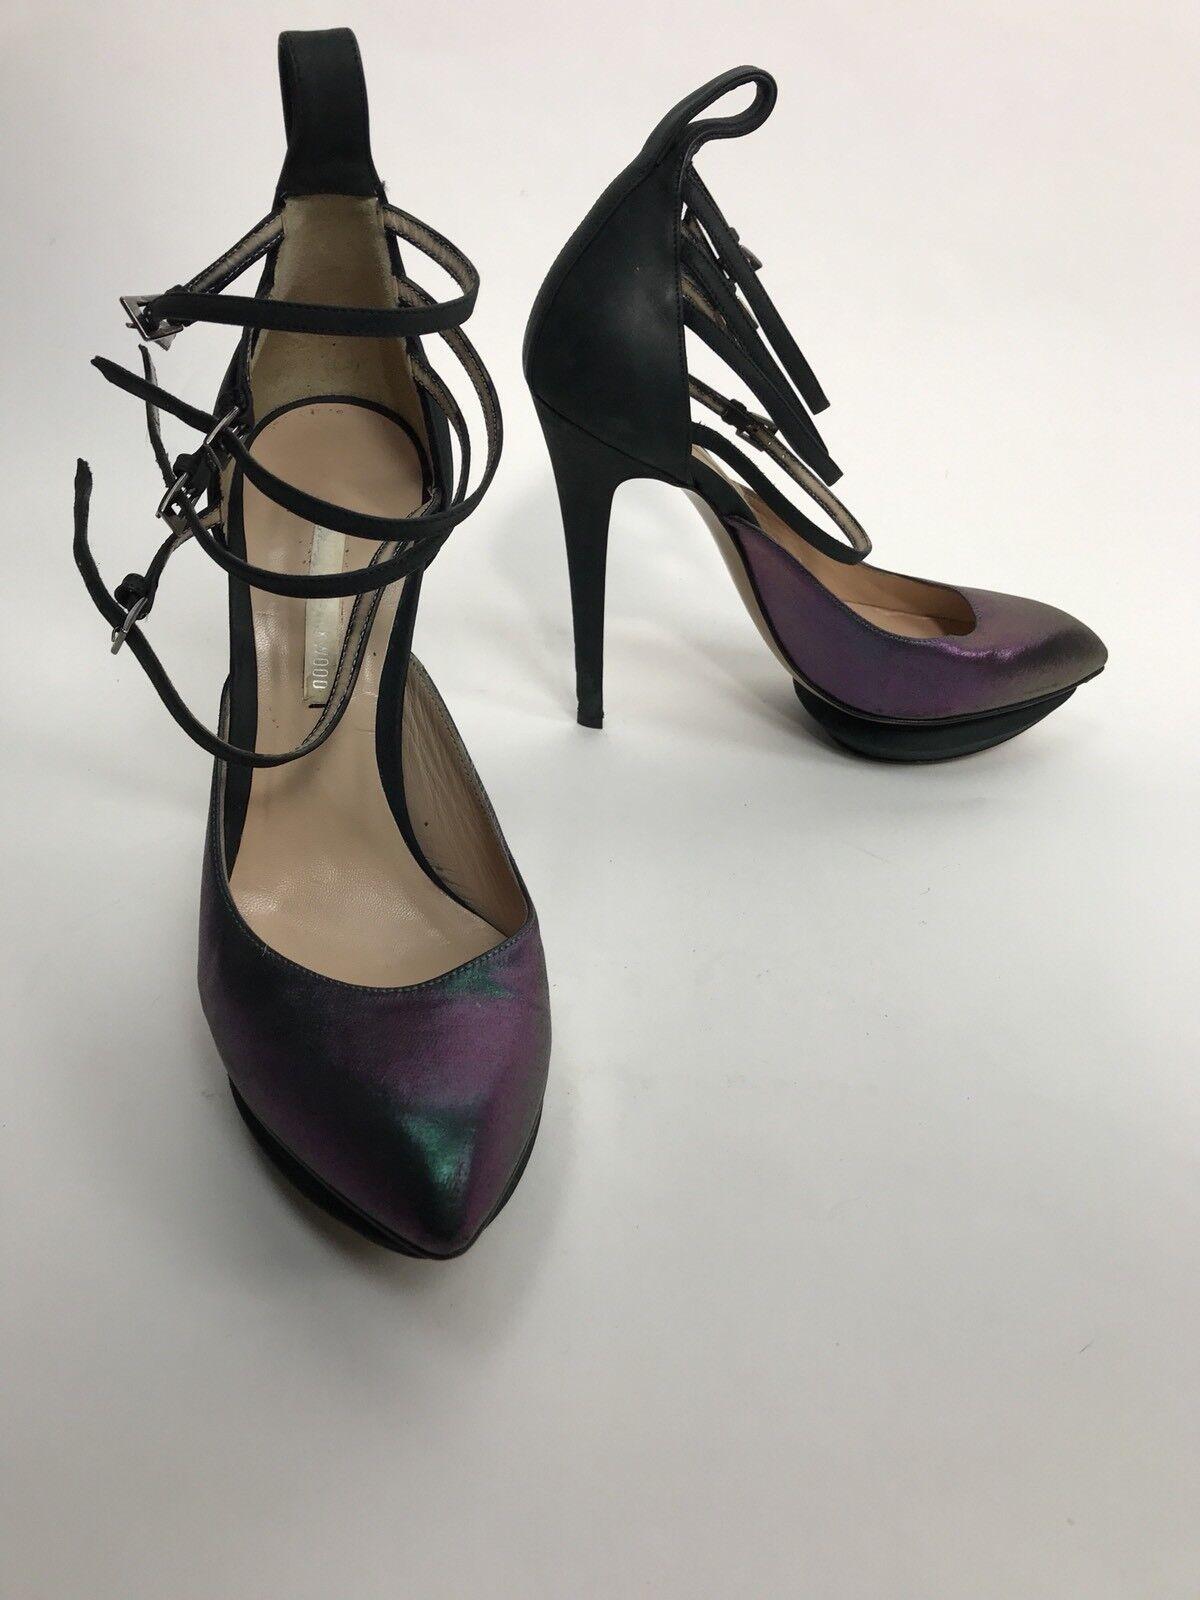 prezzi bassi di tutti i giorni Preowned Nicholas Kirkwood donna High High High Heels SZ 38 Pumps  salutare